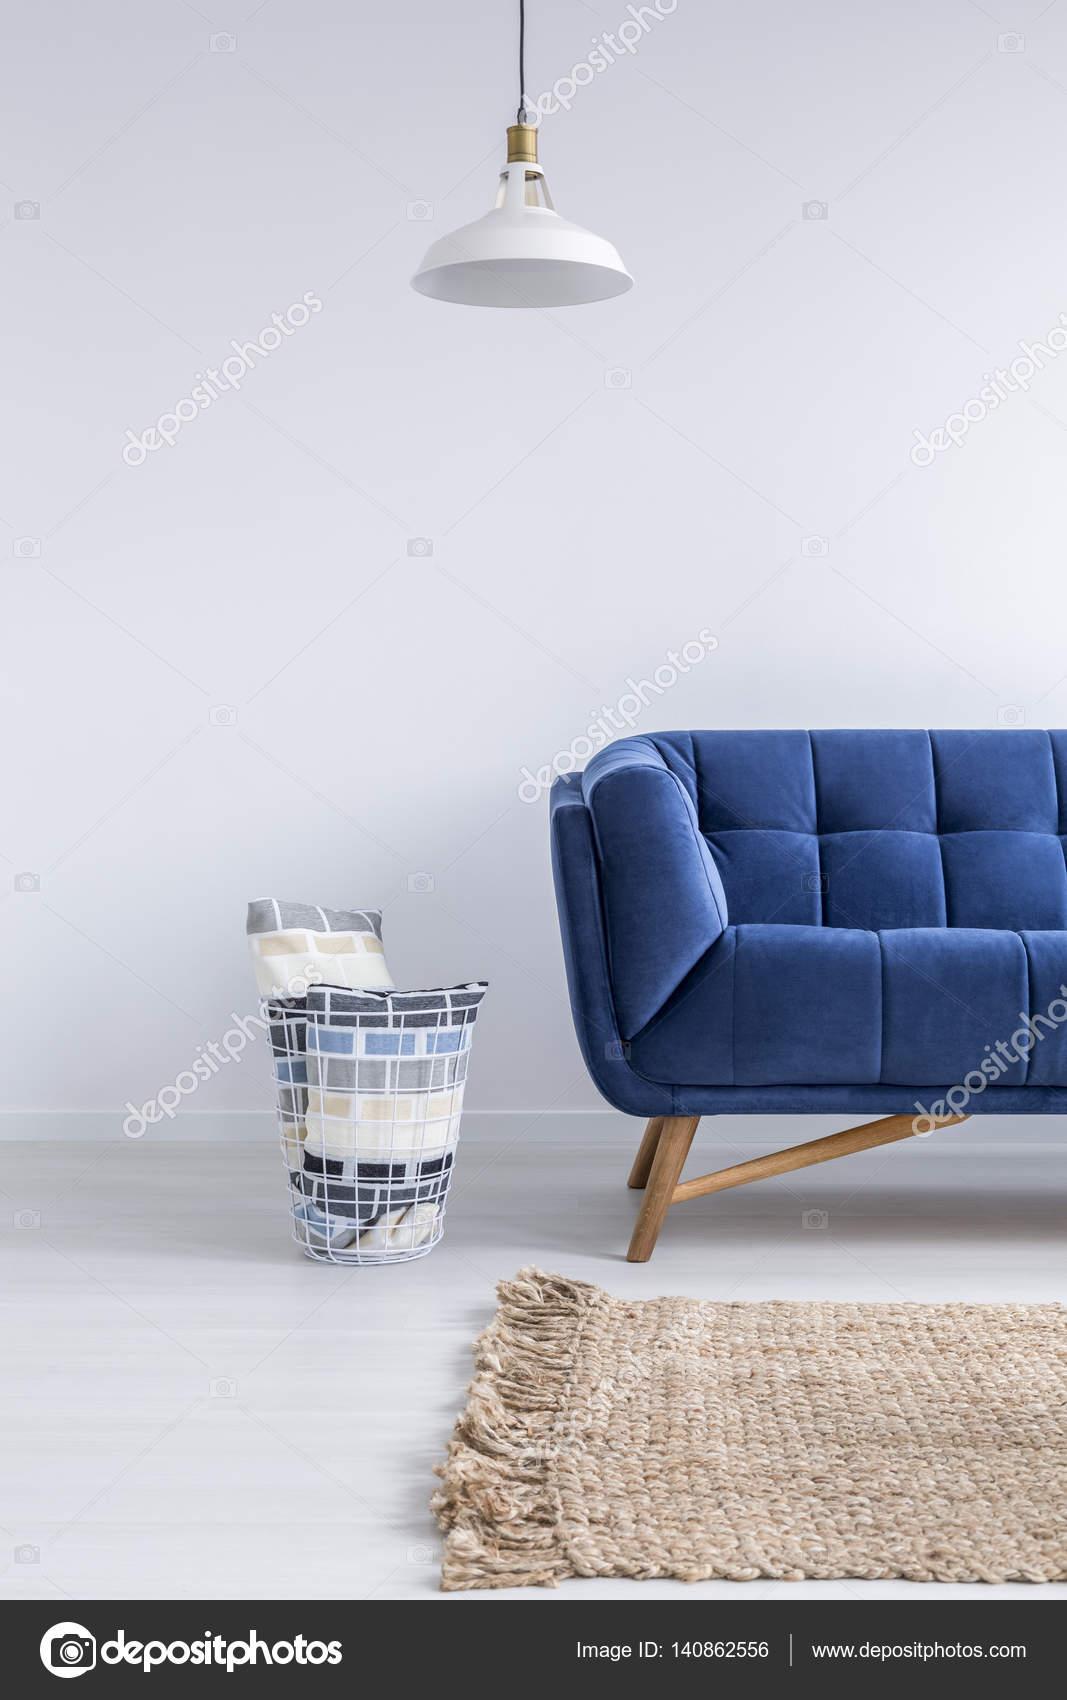 Minimalistische Zimmer Mit Sofa Stockfoto C Photographee Eu 140862556